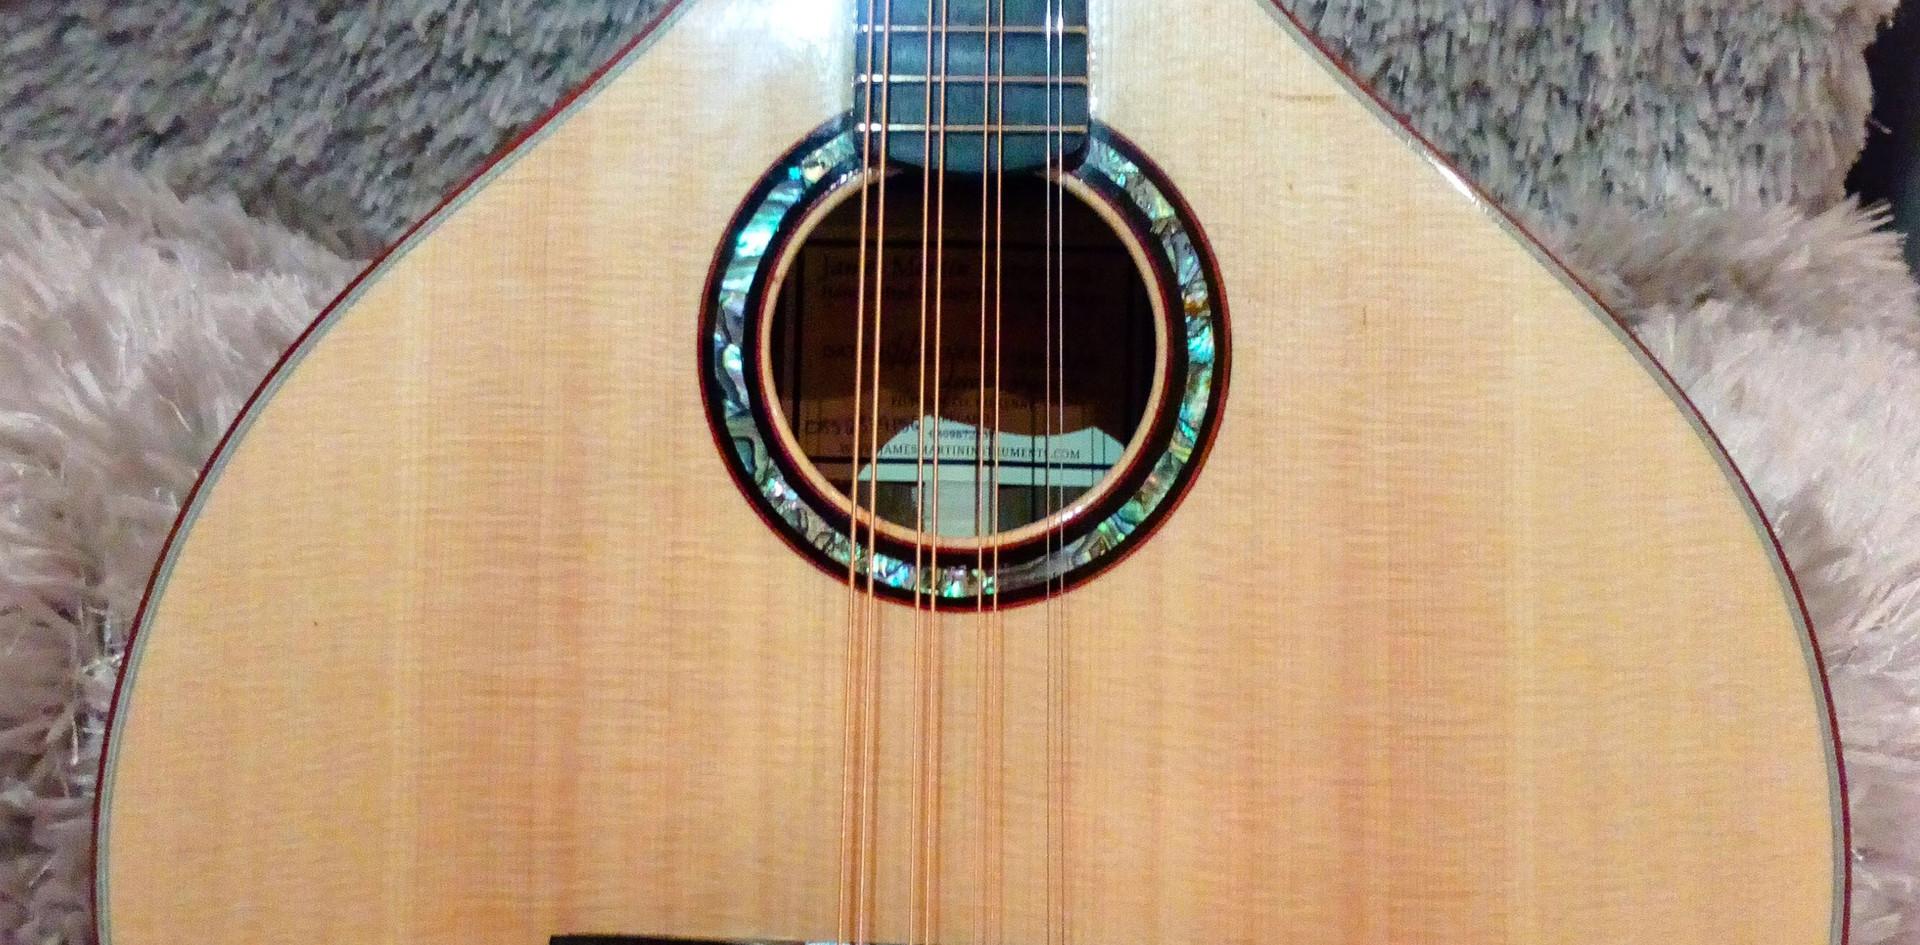 Handmade Pau Ferro Octave MandolinHandmade Pau Ferro Octave Mandolin